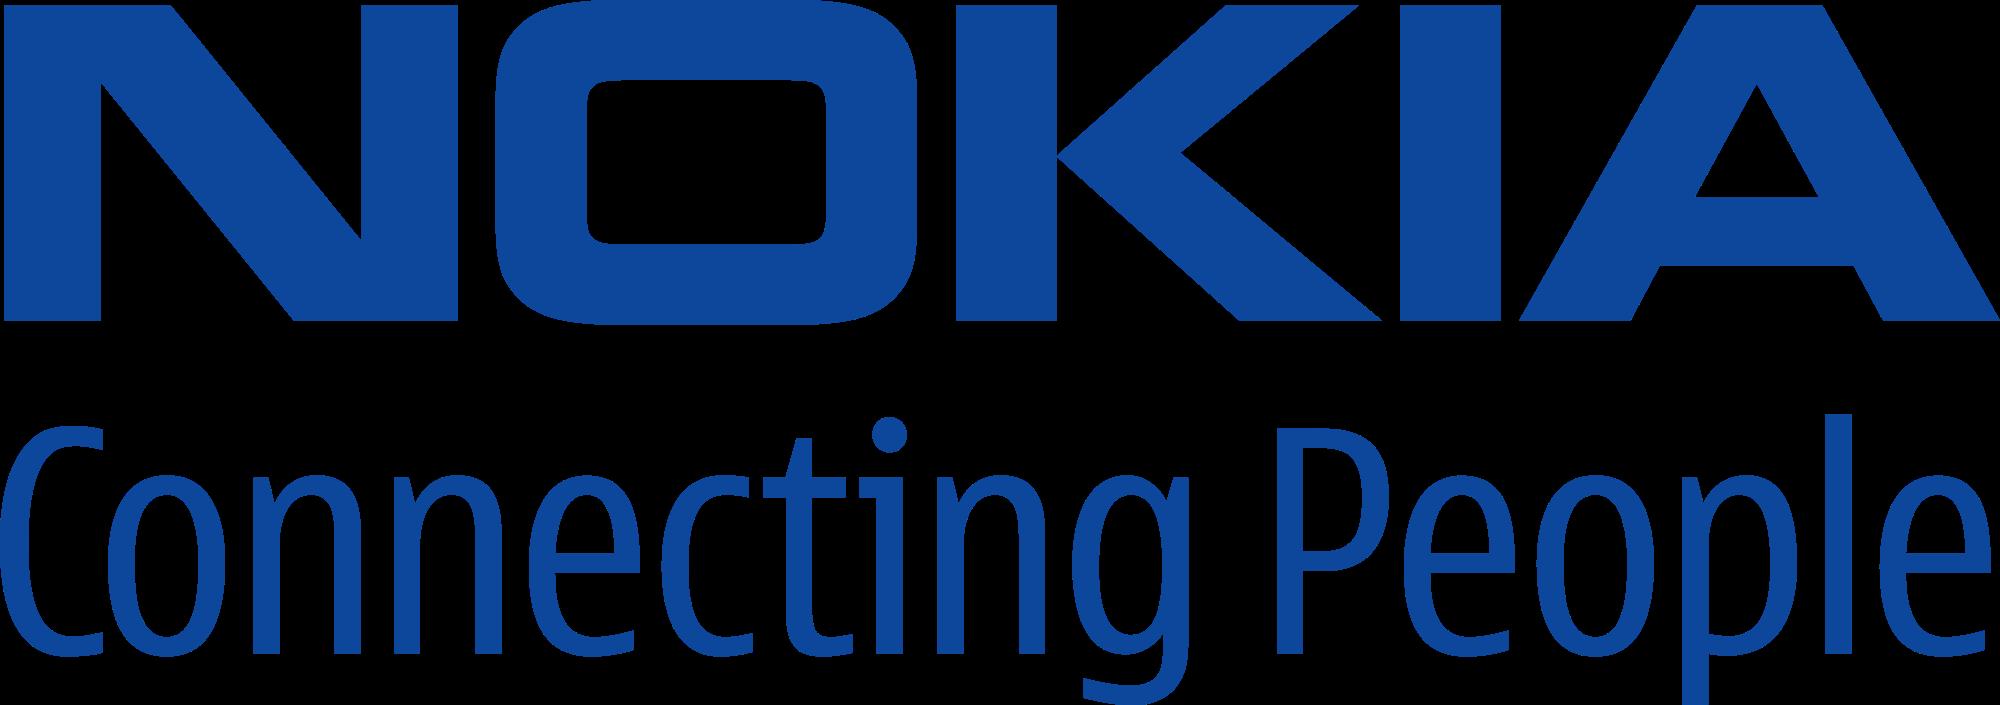 nokia connecting people slogan logo png #1482